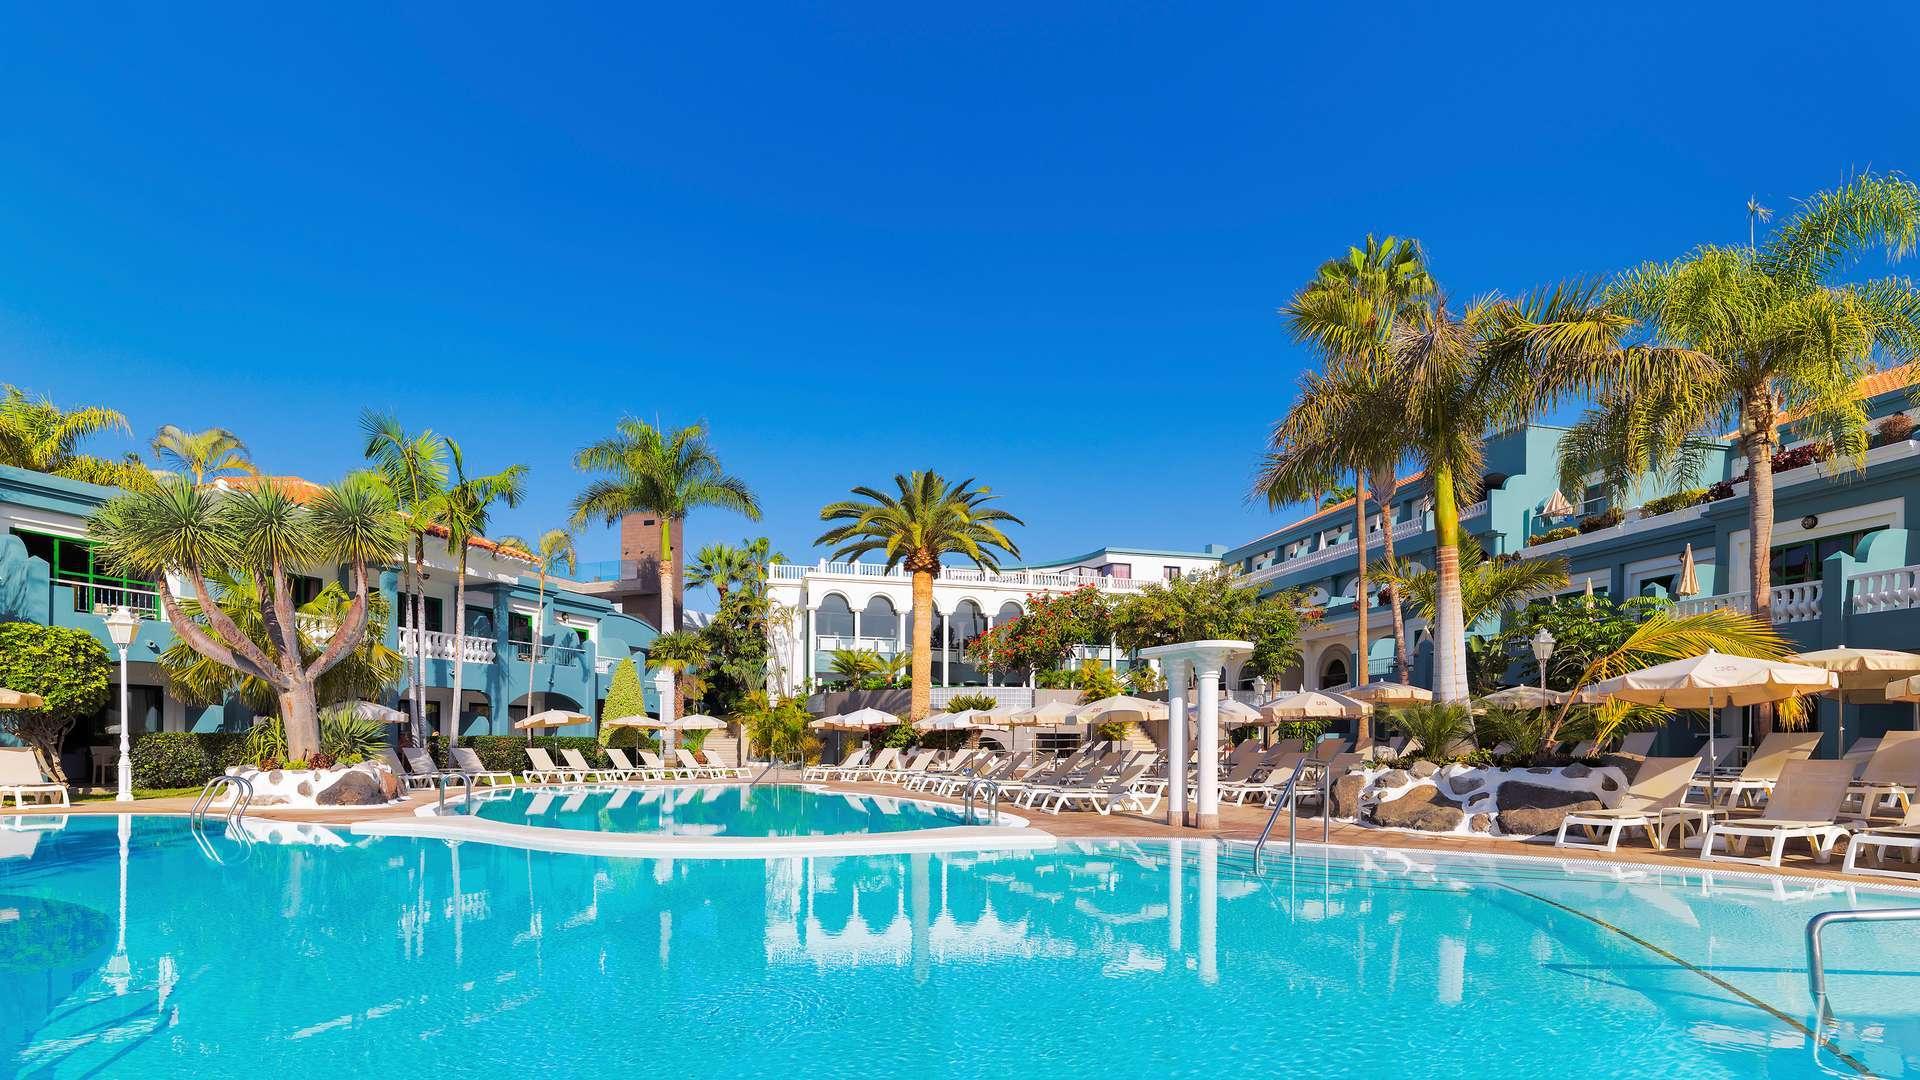 Adrian Hoteles Colon Guanahani A Kuoni Hotel In Tenerife